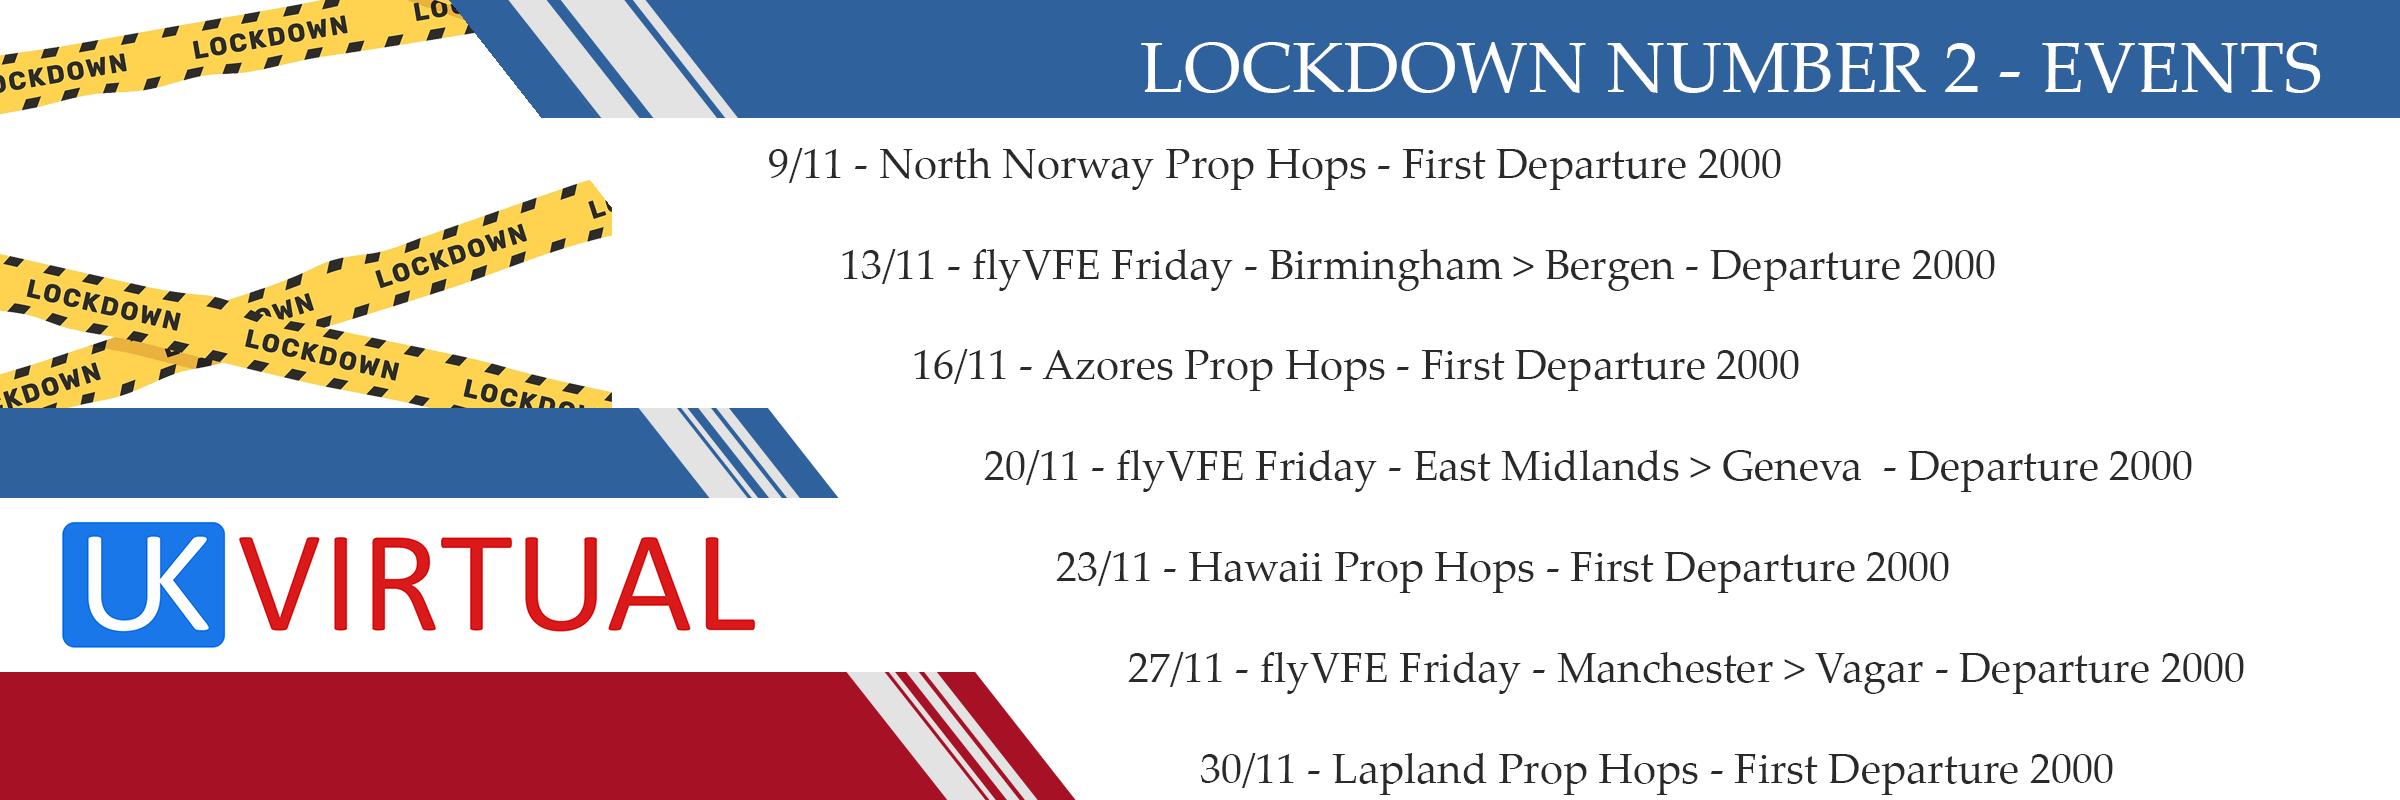 Lockdown Number 2 – Events